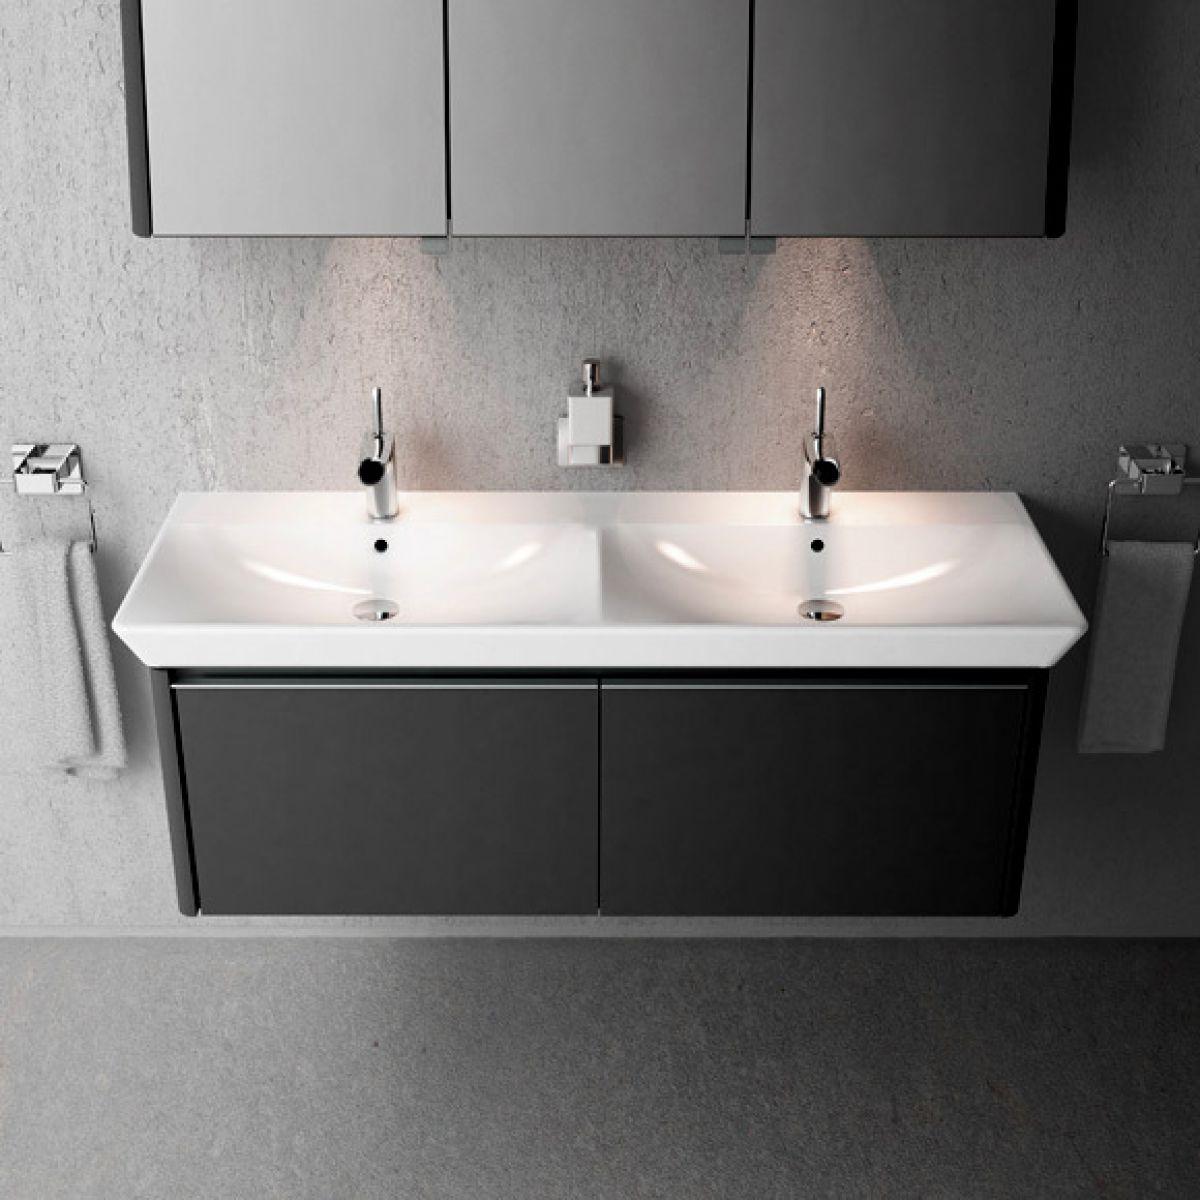 Vitra T4 Double Basin : UK Bathrooms